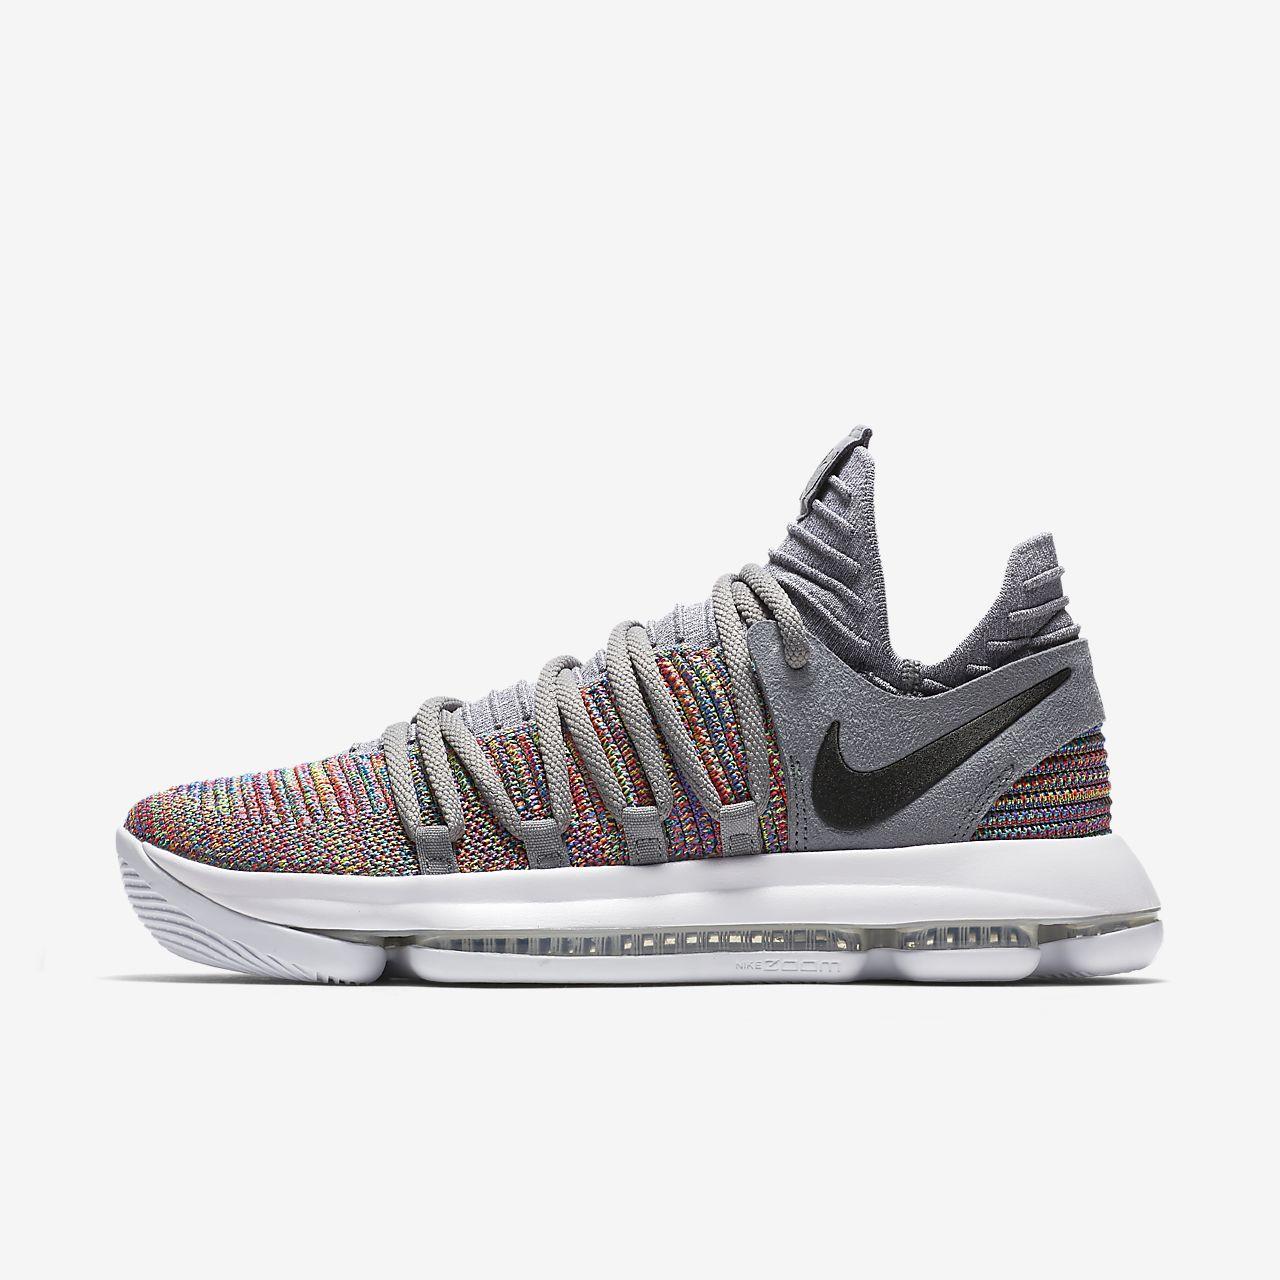 Nike Zoom KD10 EP 男子篮球鞋